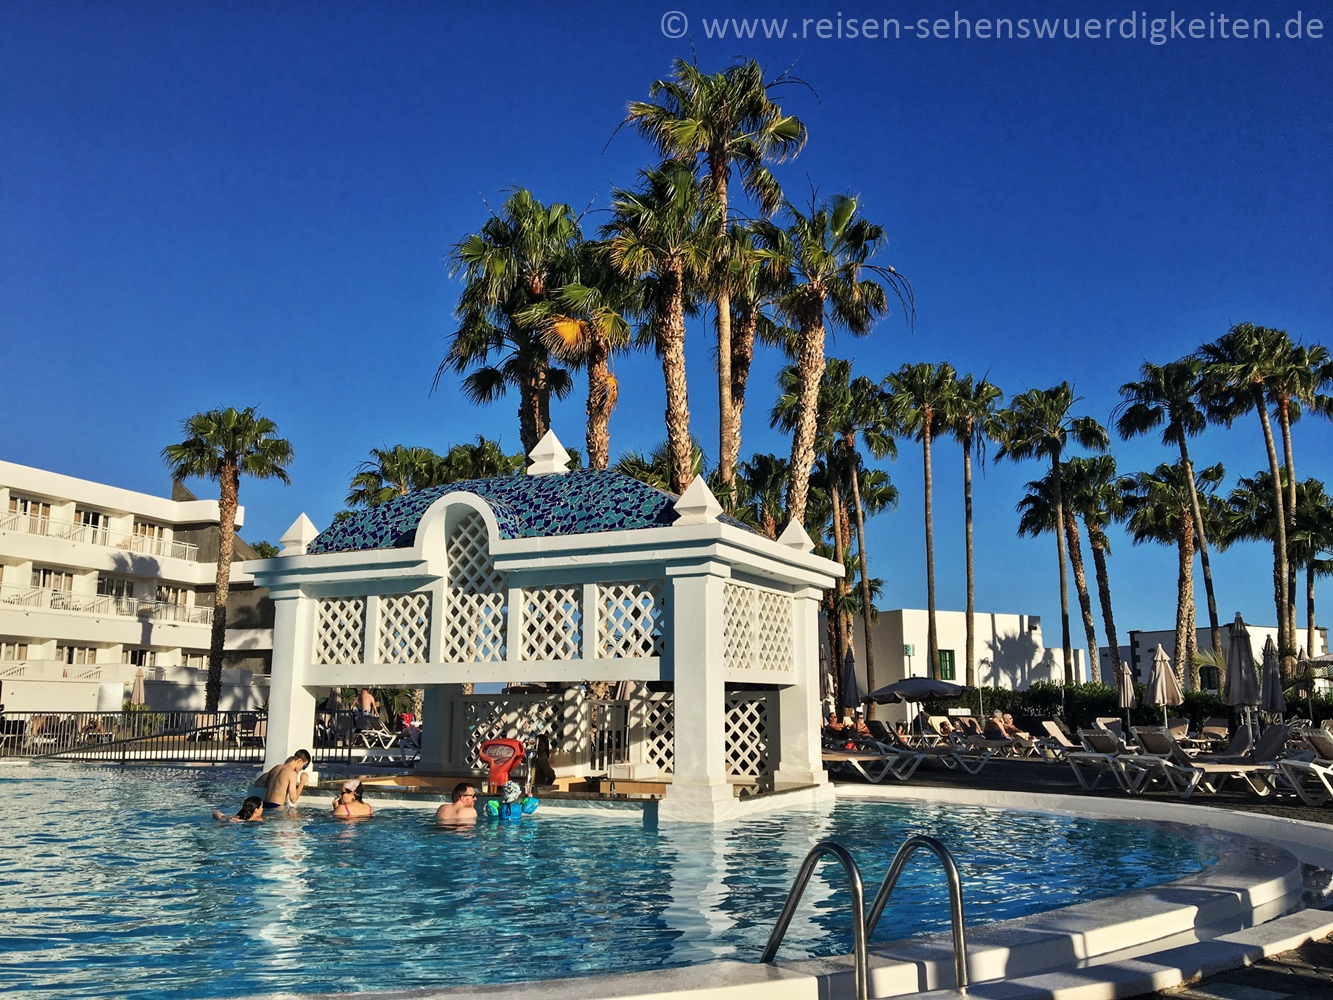 Pool mit Poolbar im Hotel Riu Paraiso Lanzarote